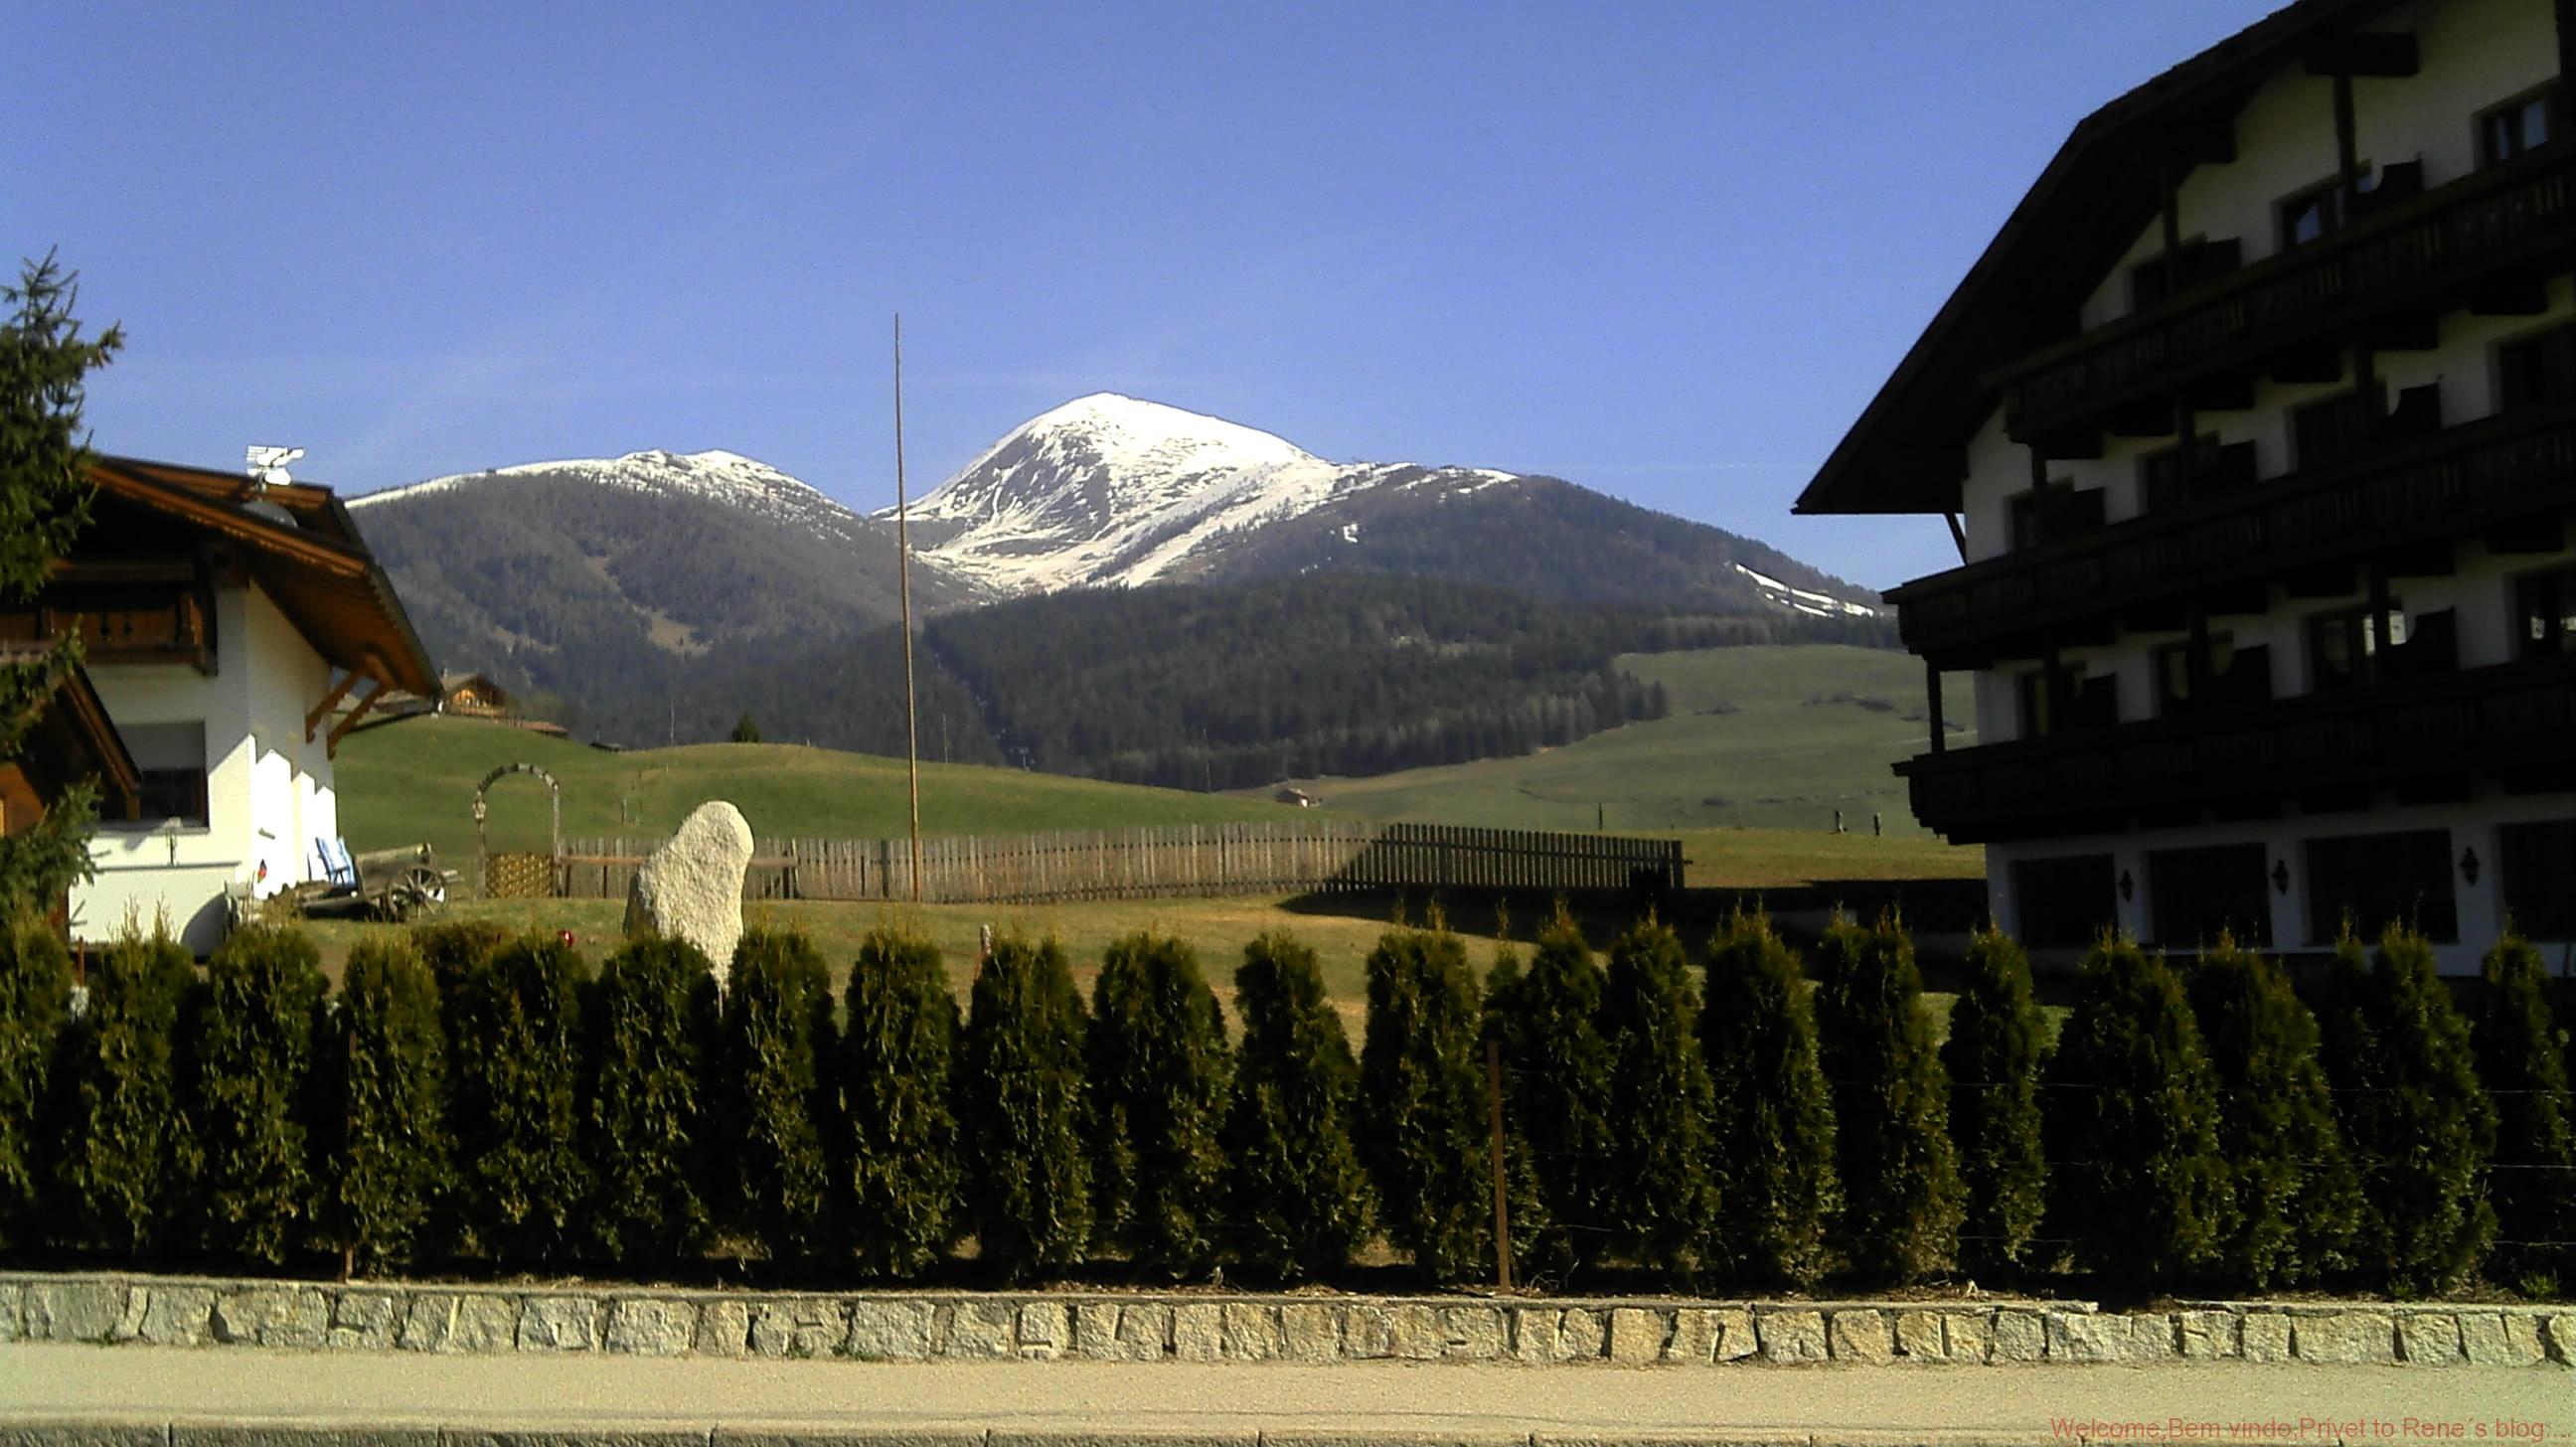 2011-04-03_11-05-49_969